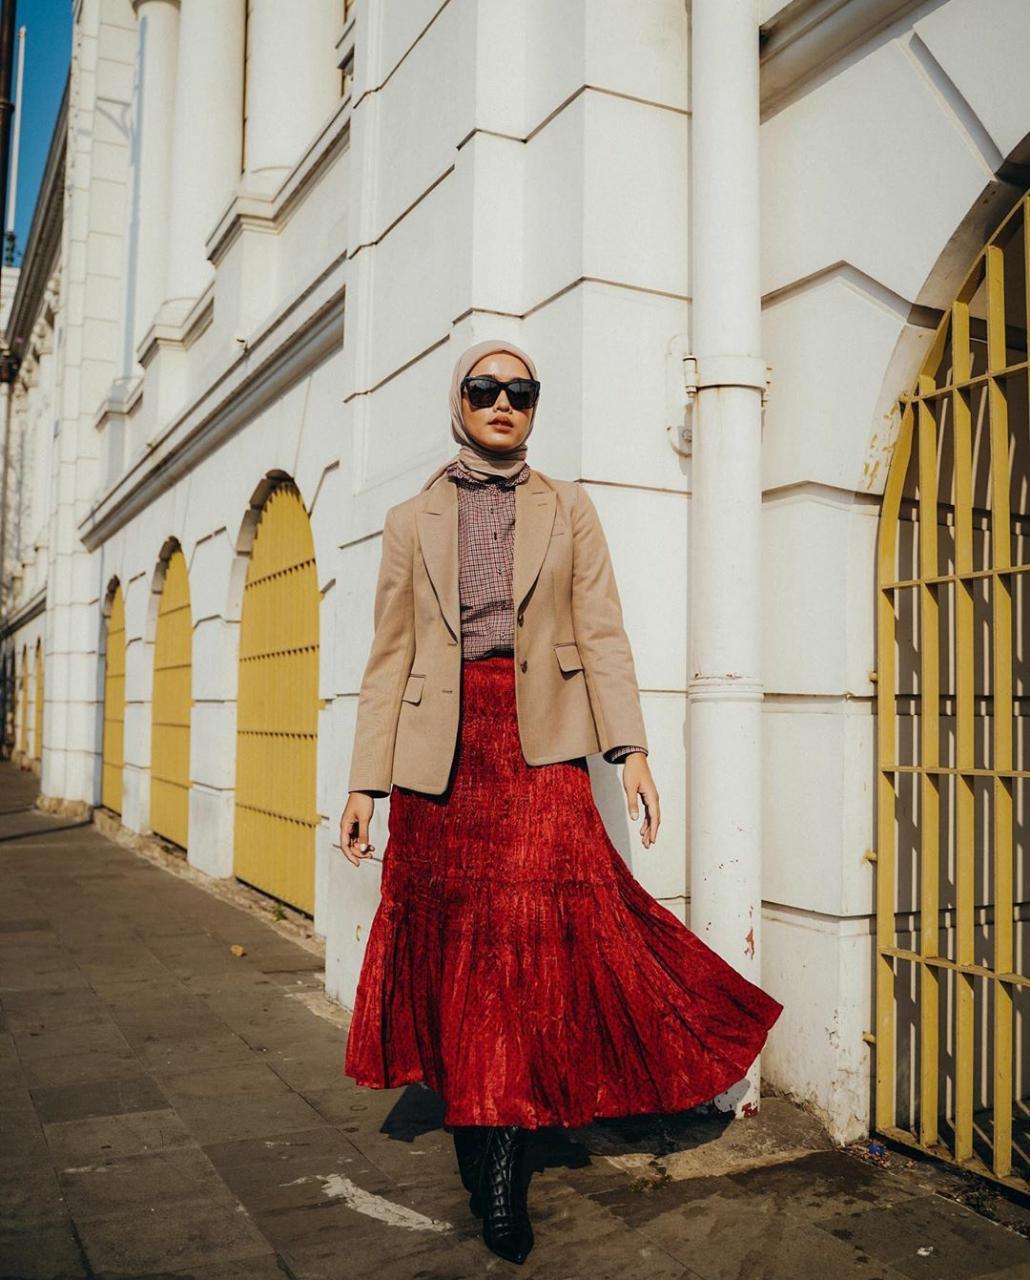 Suka Outfit Warna Cokelat? Simak Variasi Mix and Match Ini Biar Makin Outstanding | Jatim TIMES